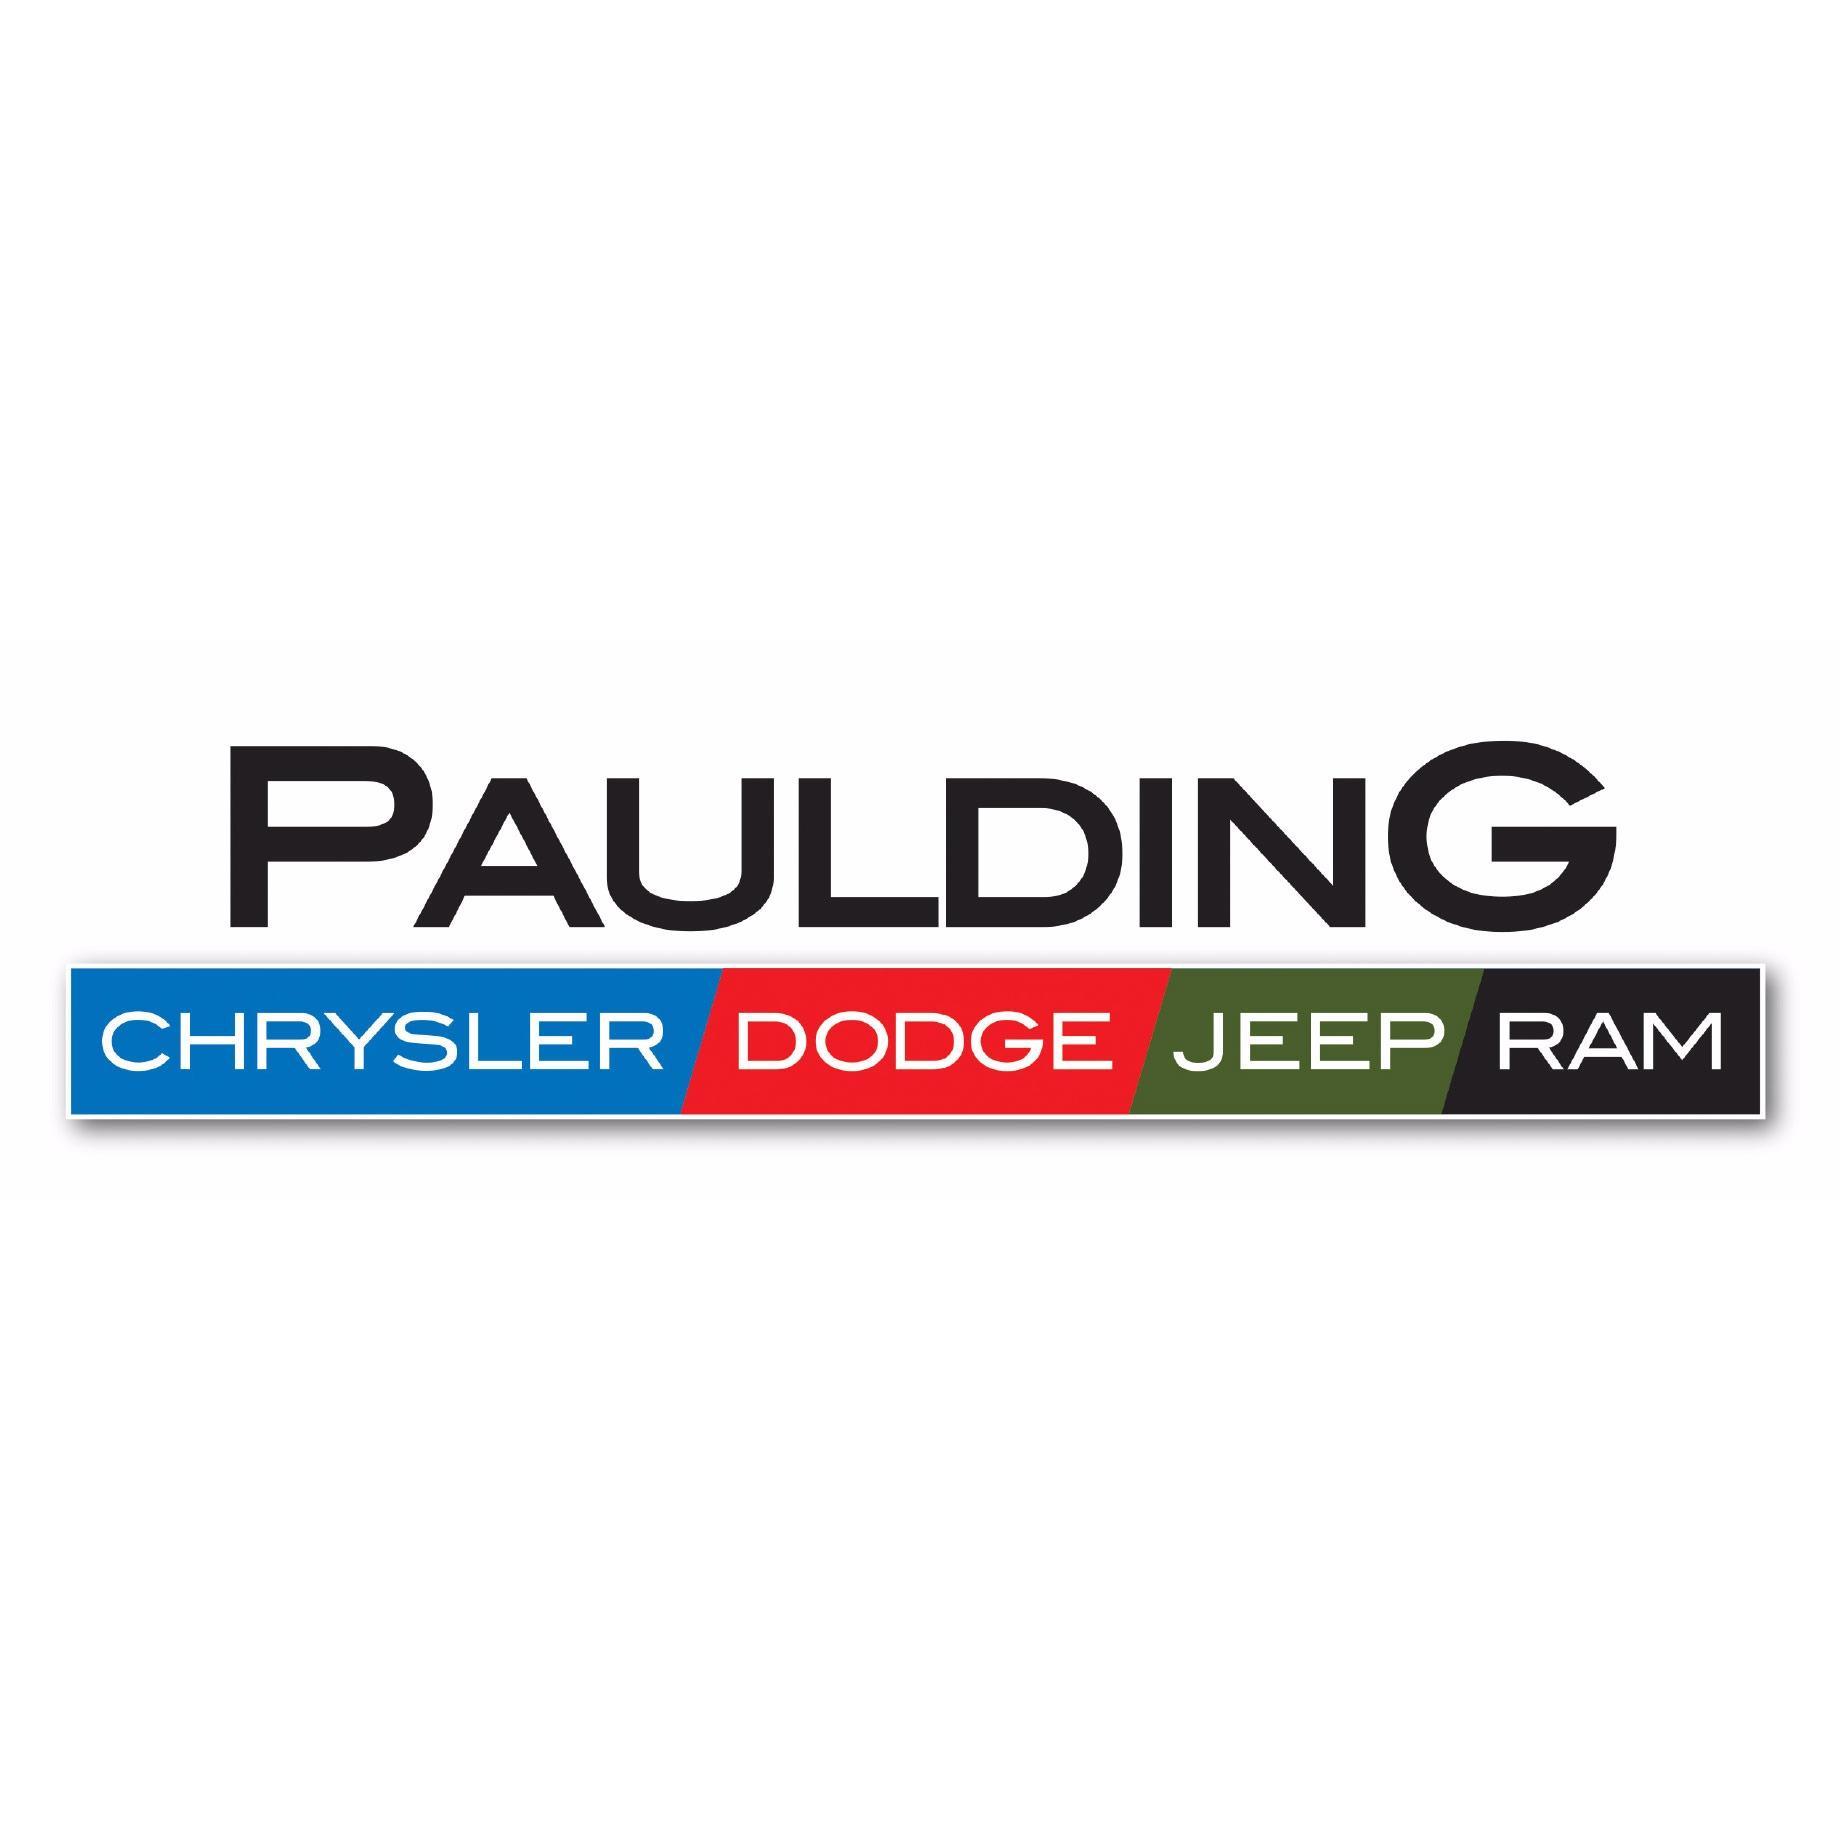 Paulding Chrysler Dodge Jeep Ram, Dallas Georgia (GA